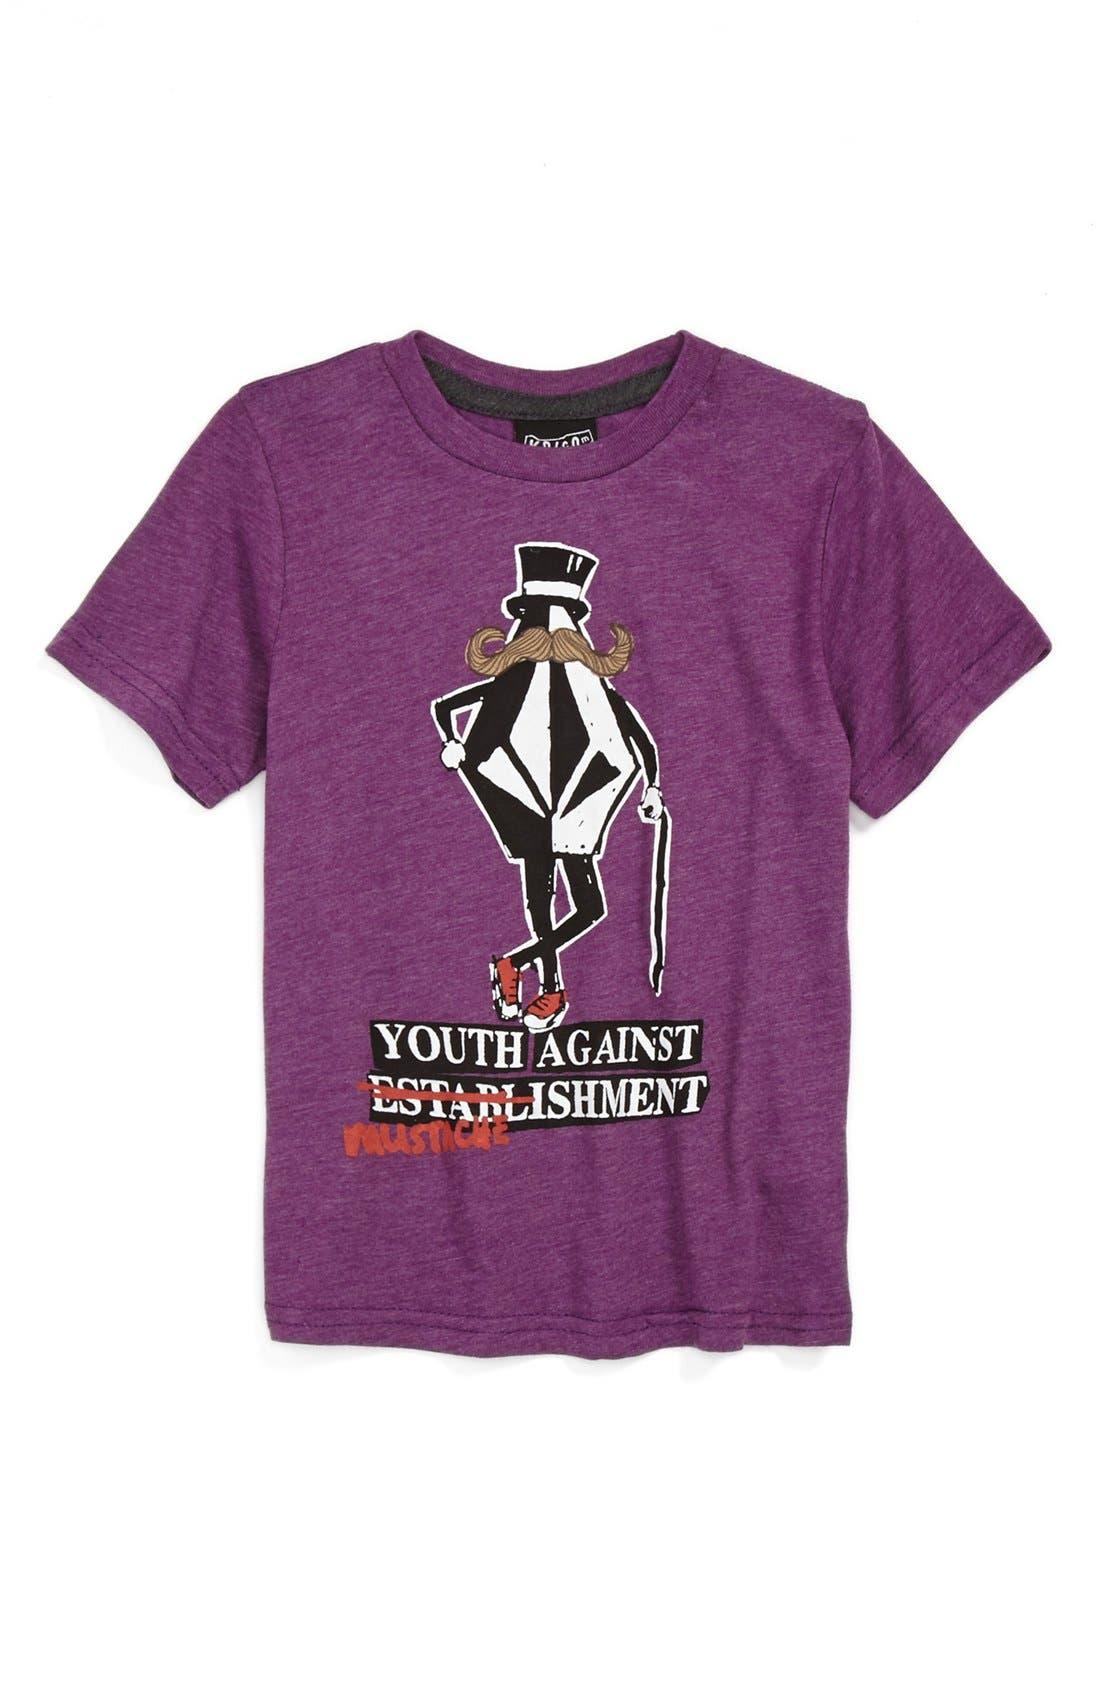 Main Image - Volcom 'Mustablishment' Graphic T-Shirt (Little Boys)